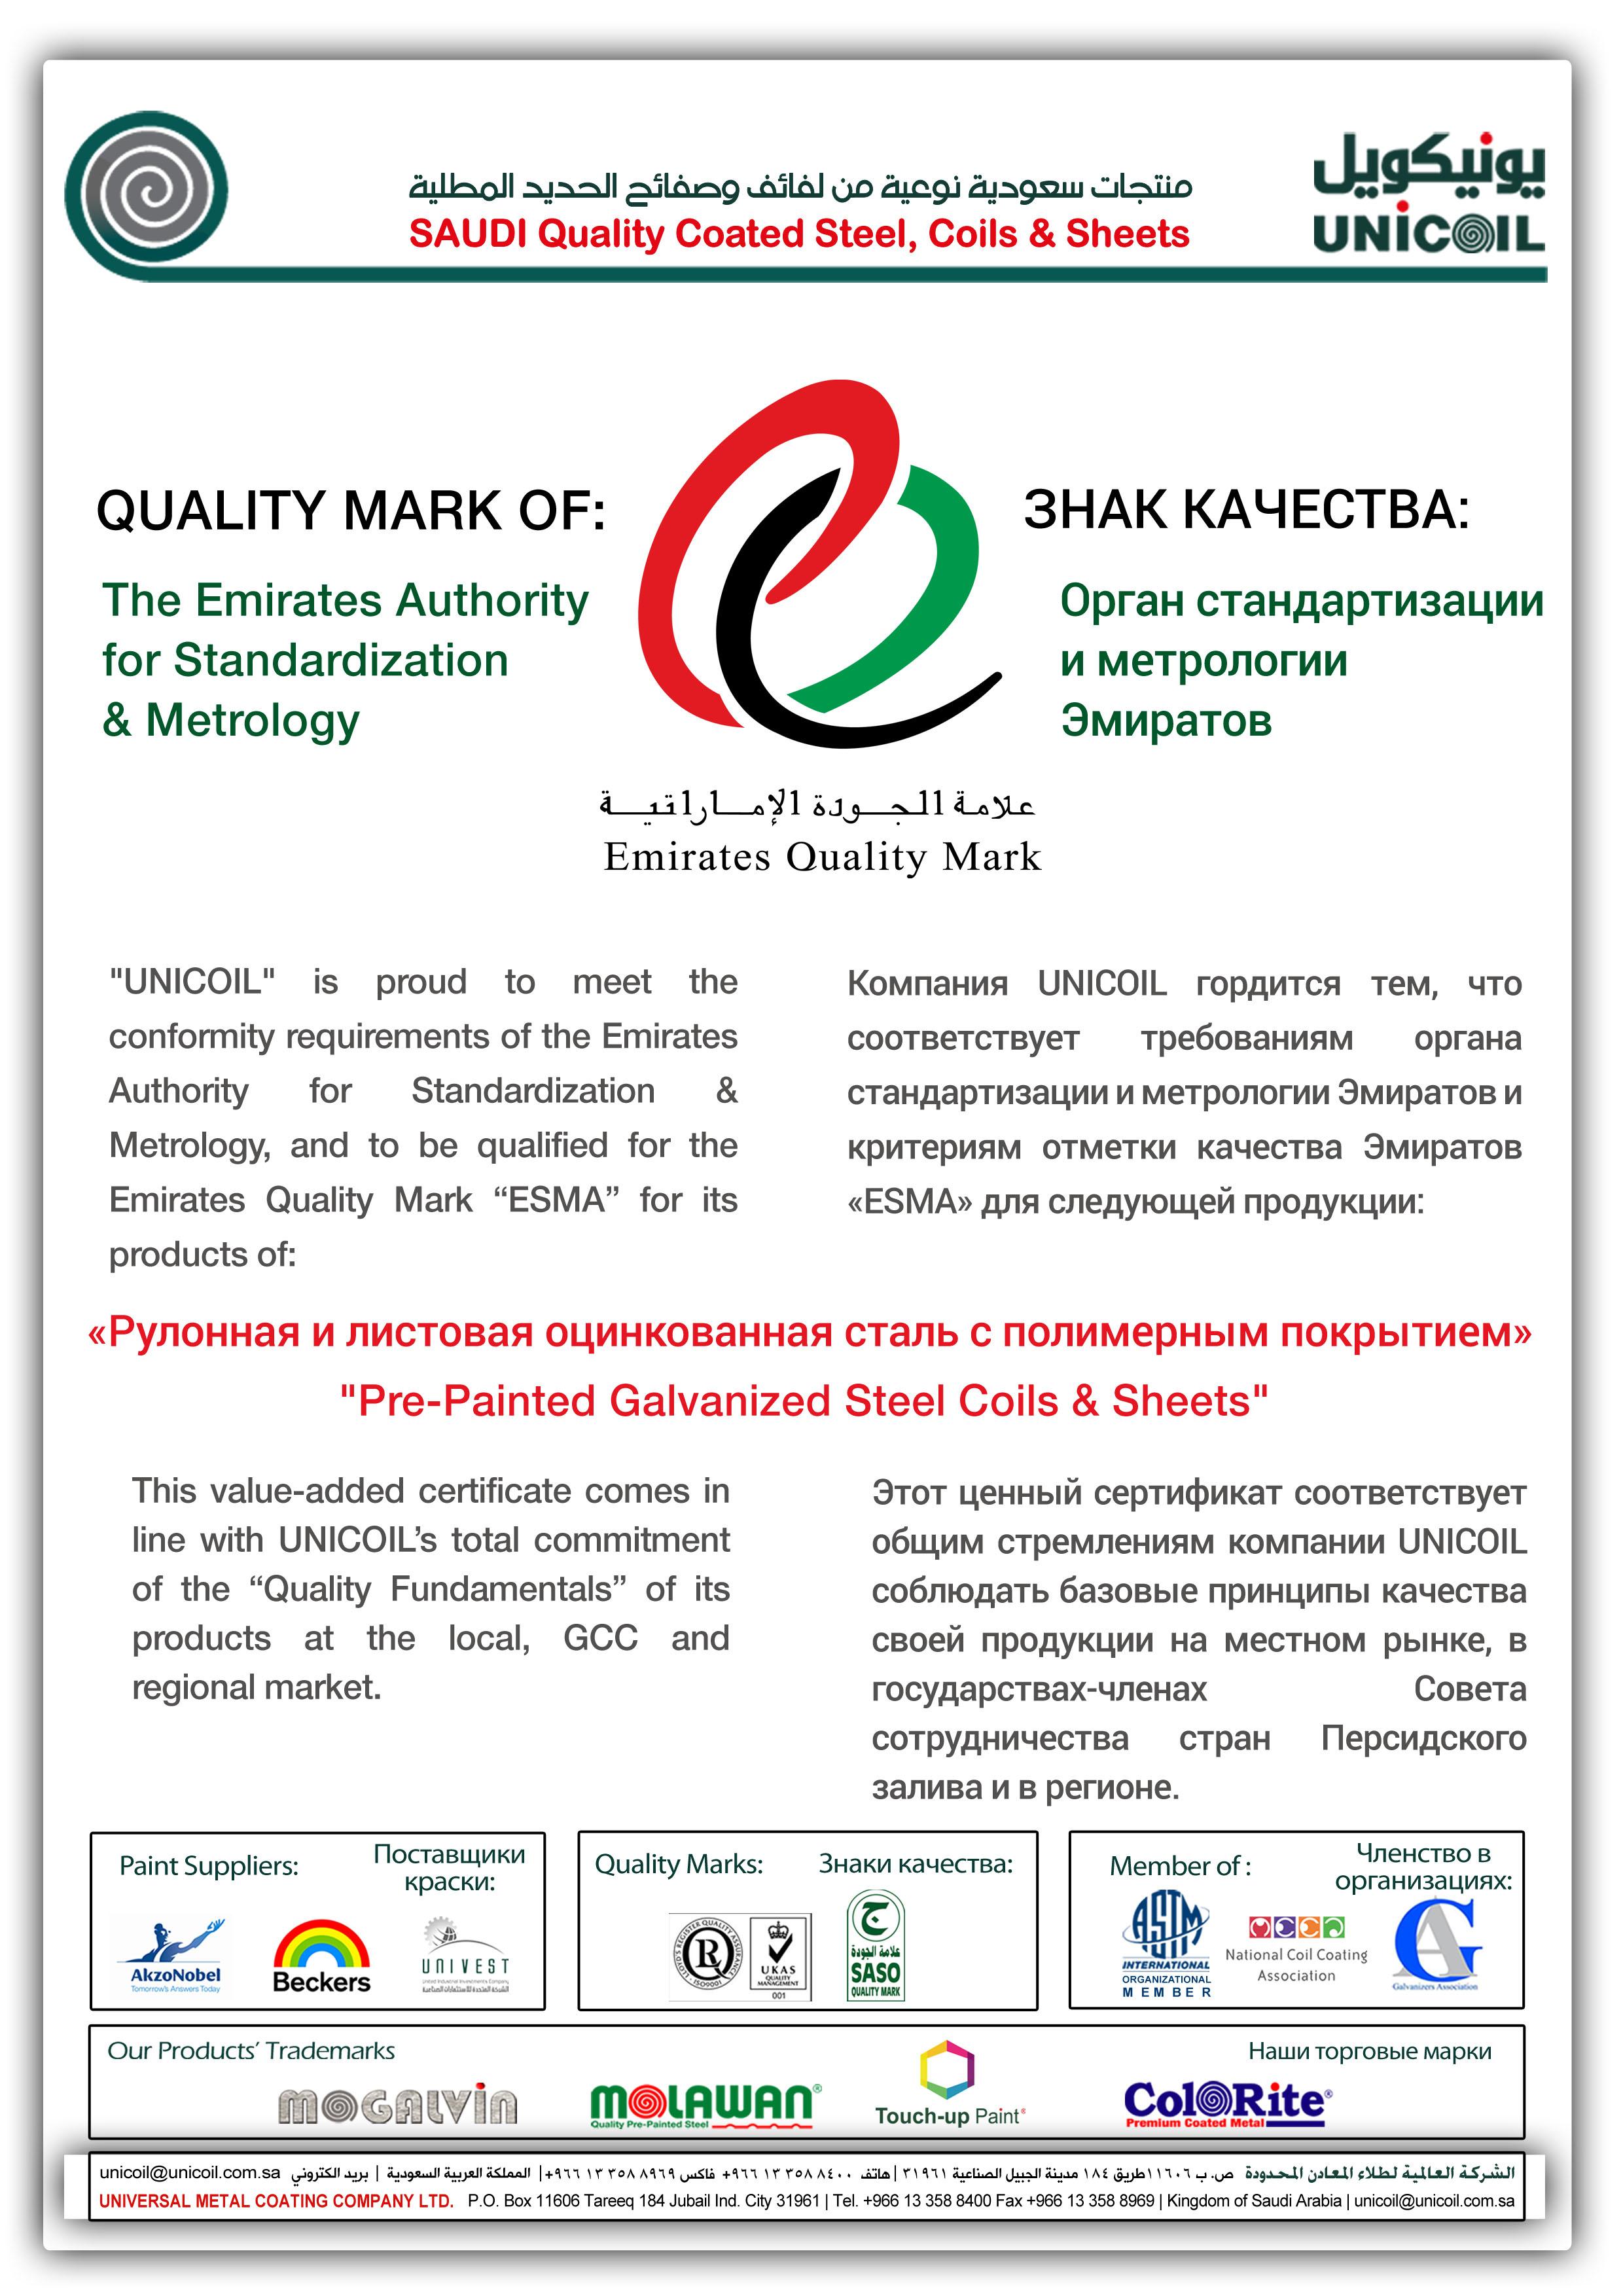 PPGI Products with ESMA